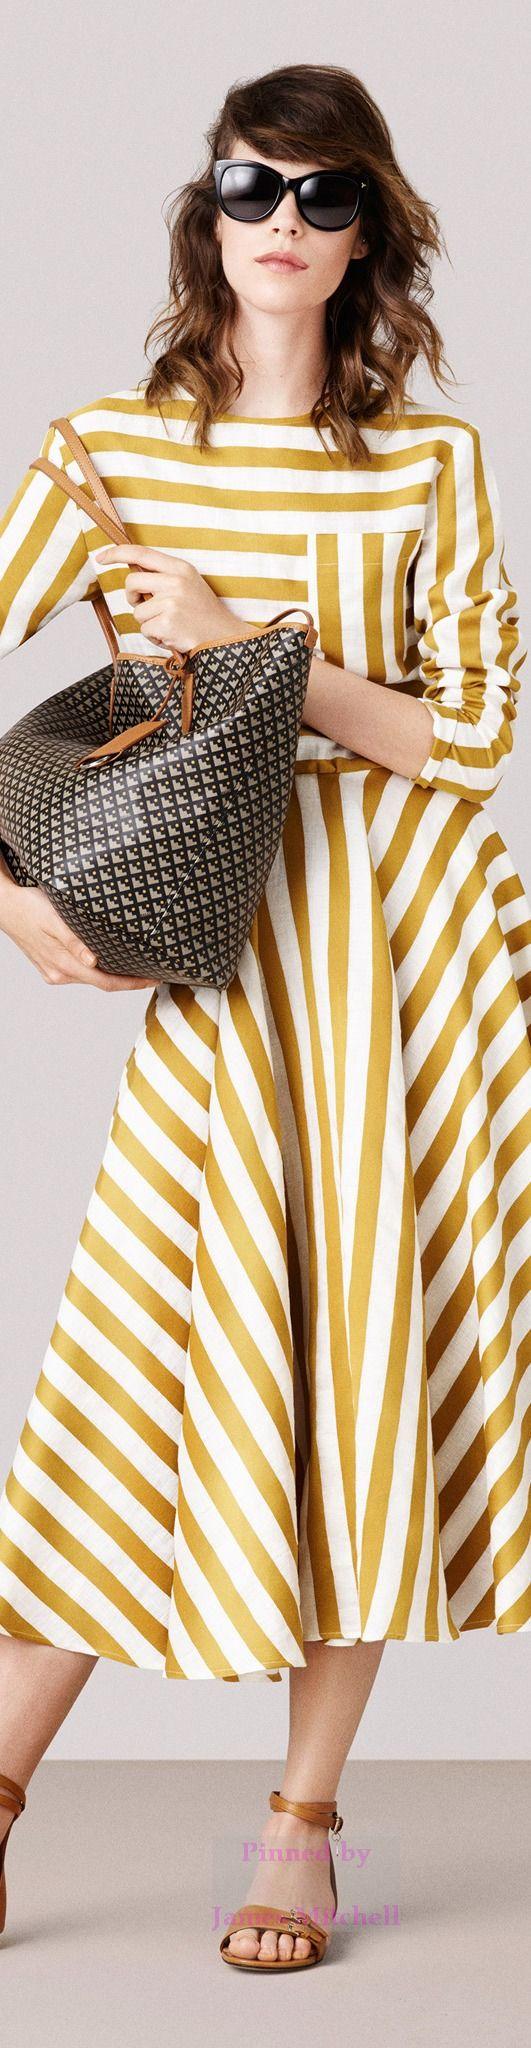 Bally Spring 2015 Ready-to-Wear